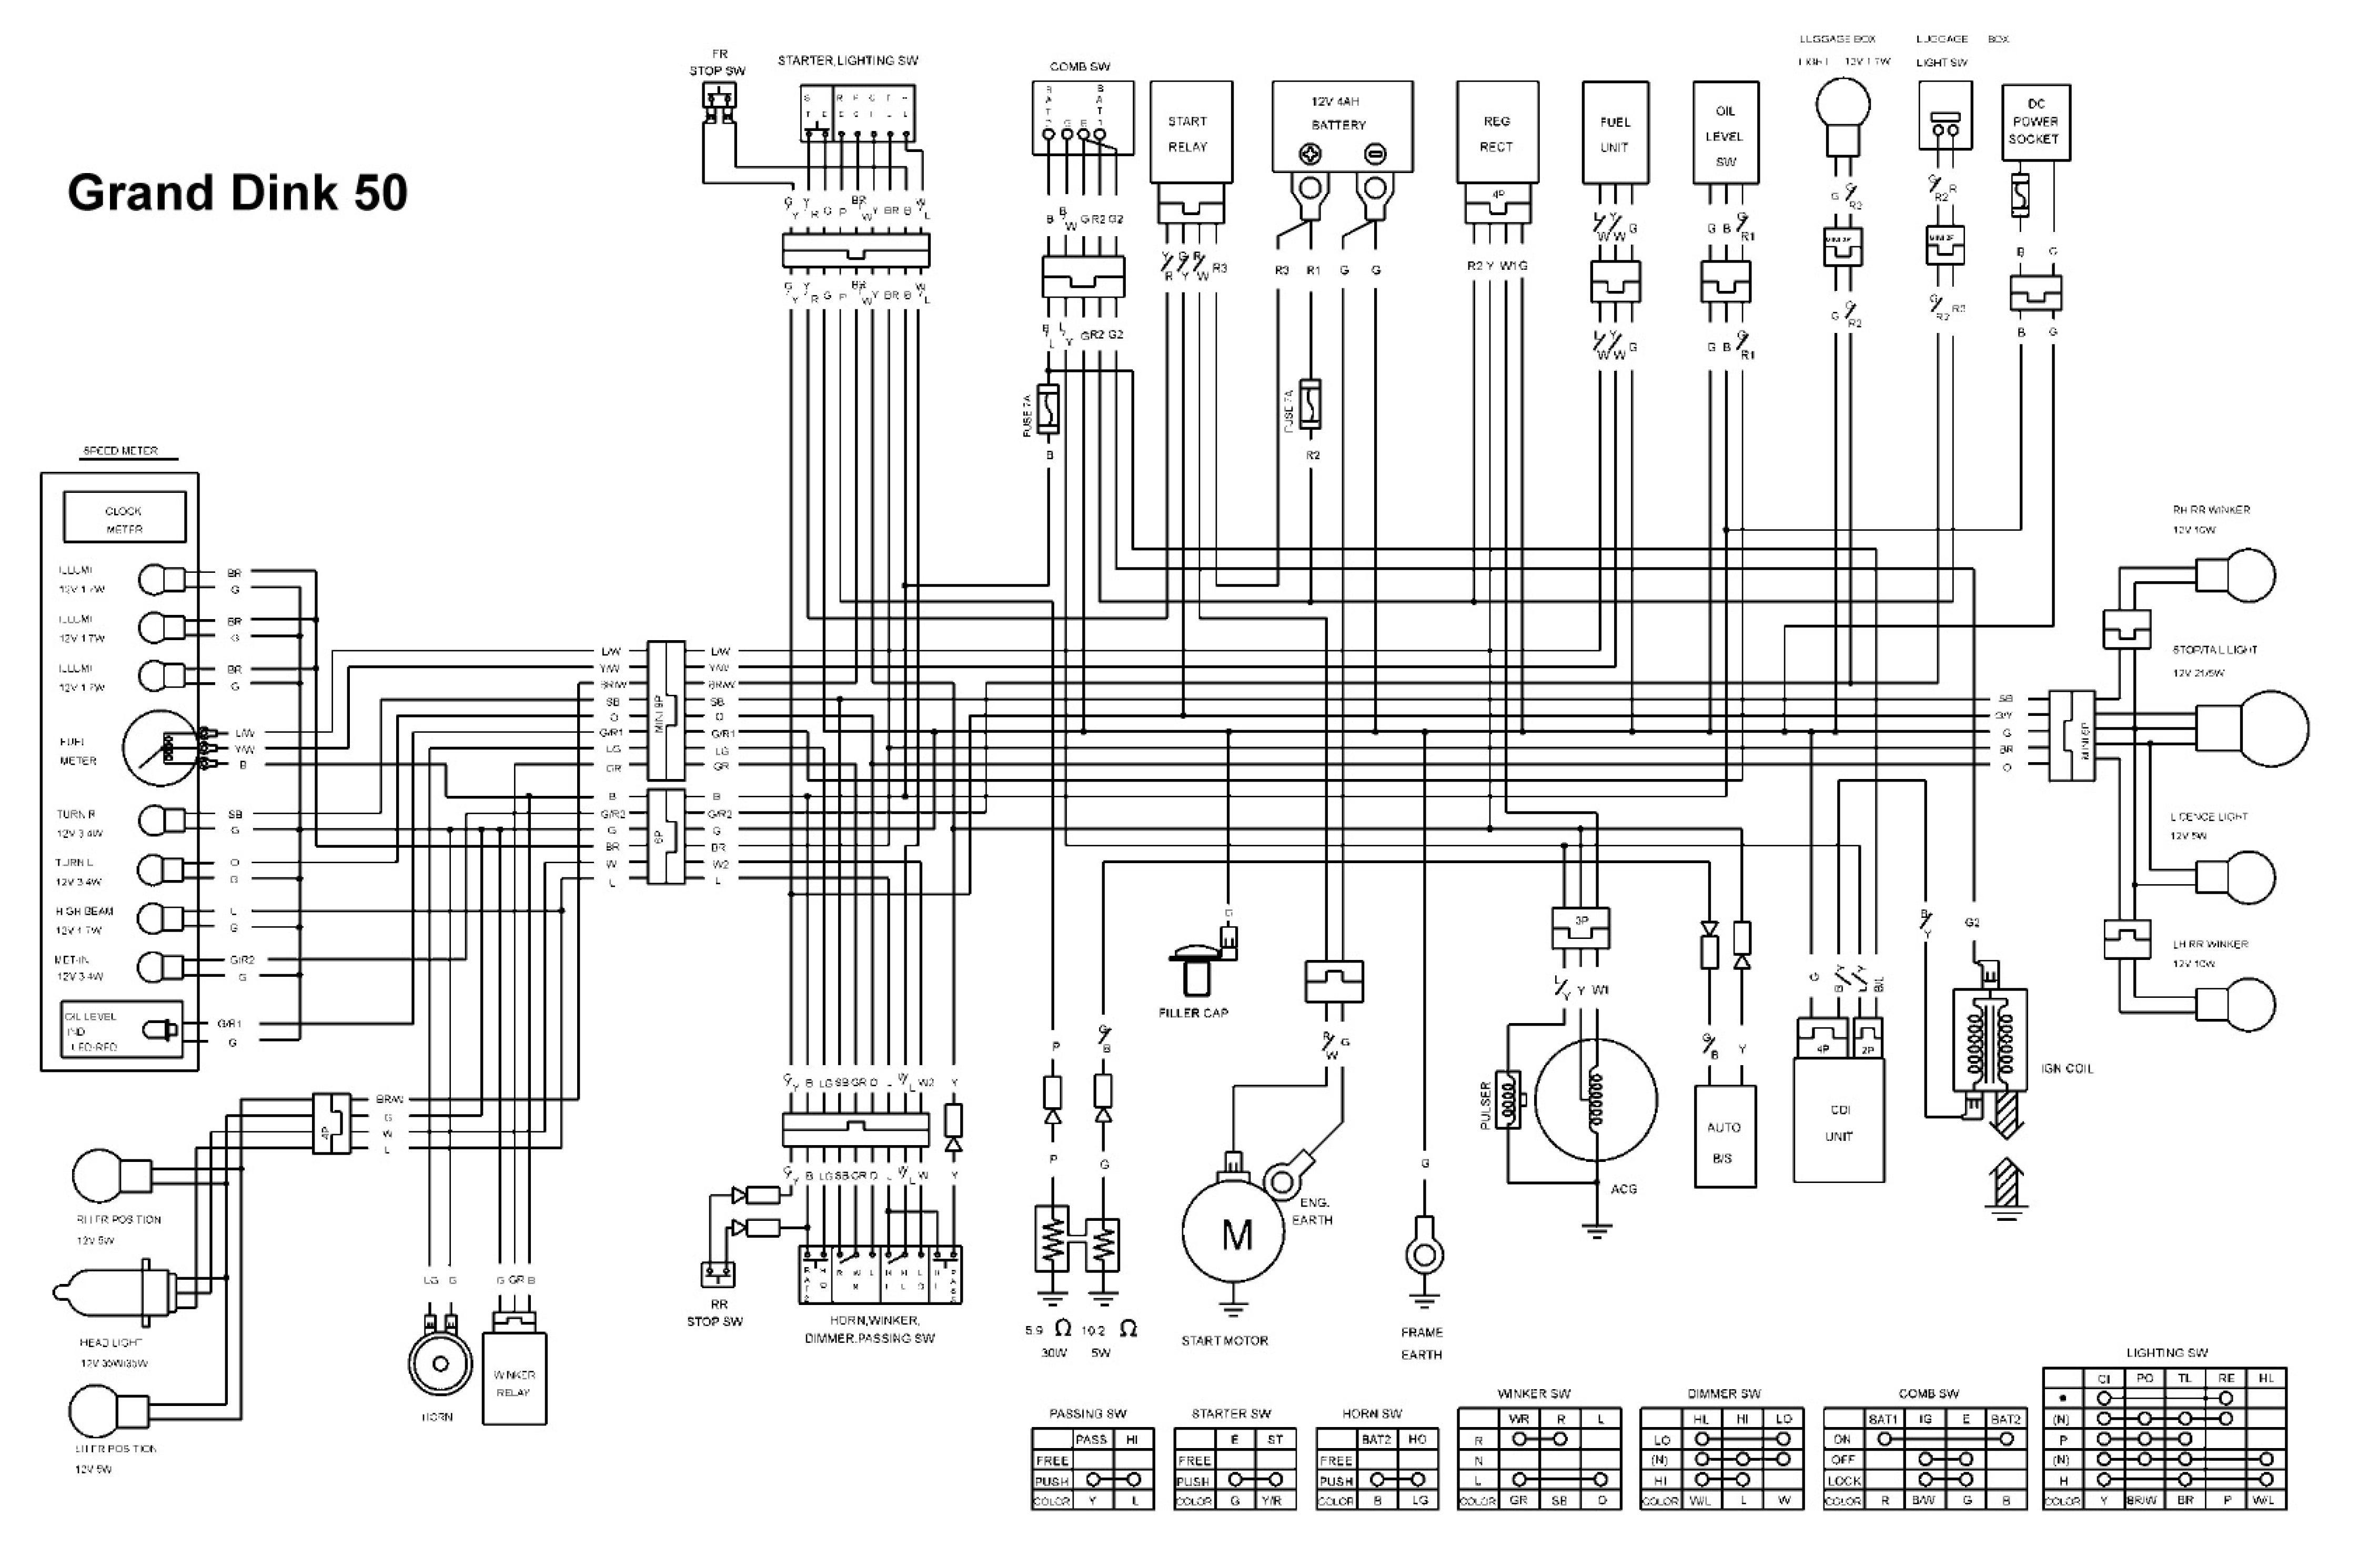 kymco agility 50 wiring diagram wiring diagram sheet kymco 250 wiring diagram kymco agility 50 wiring [ 4482 x 2981 Pixel ]